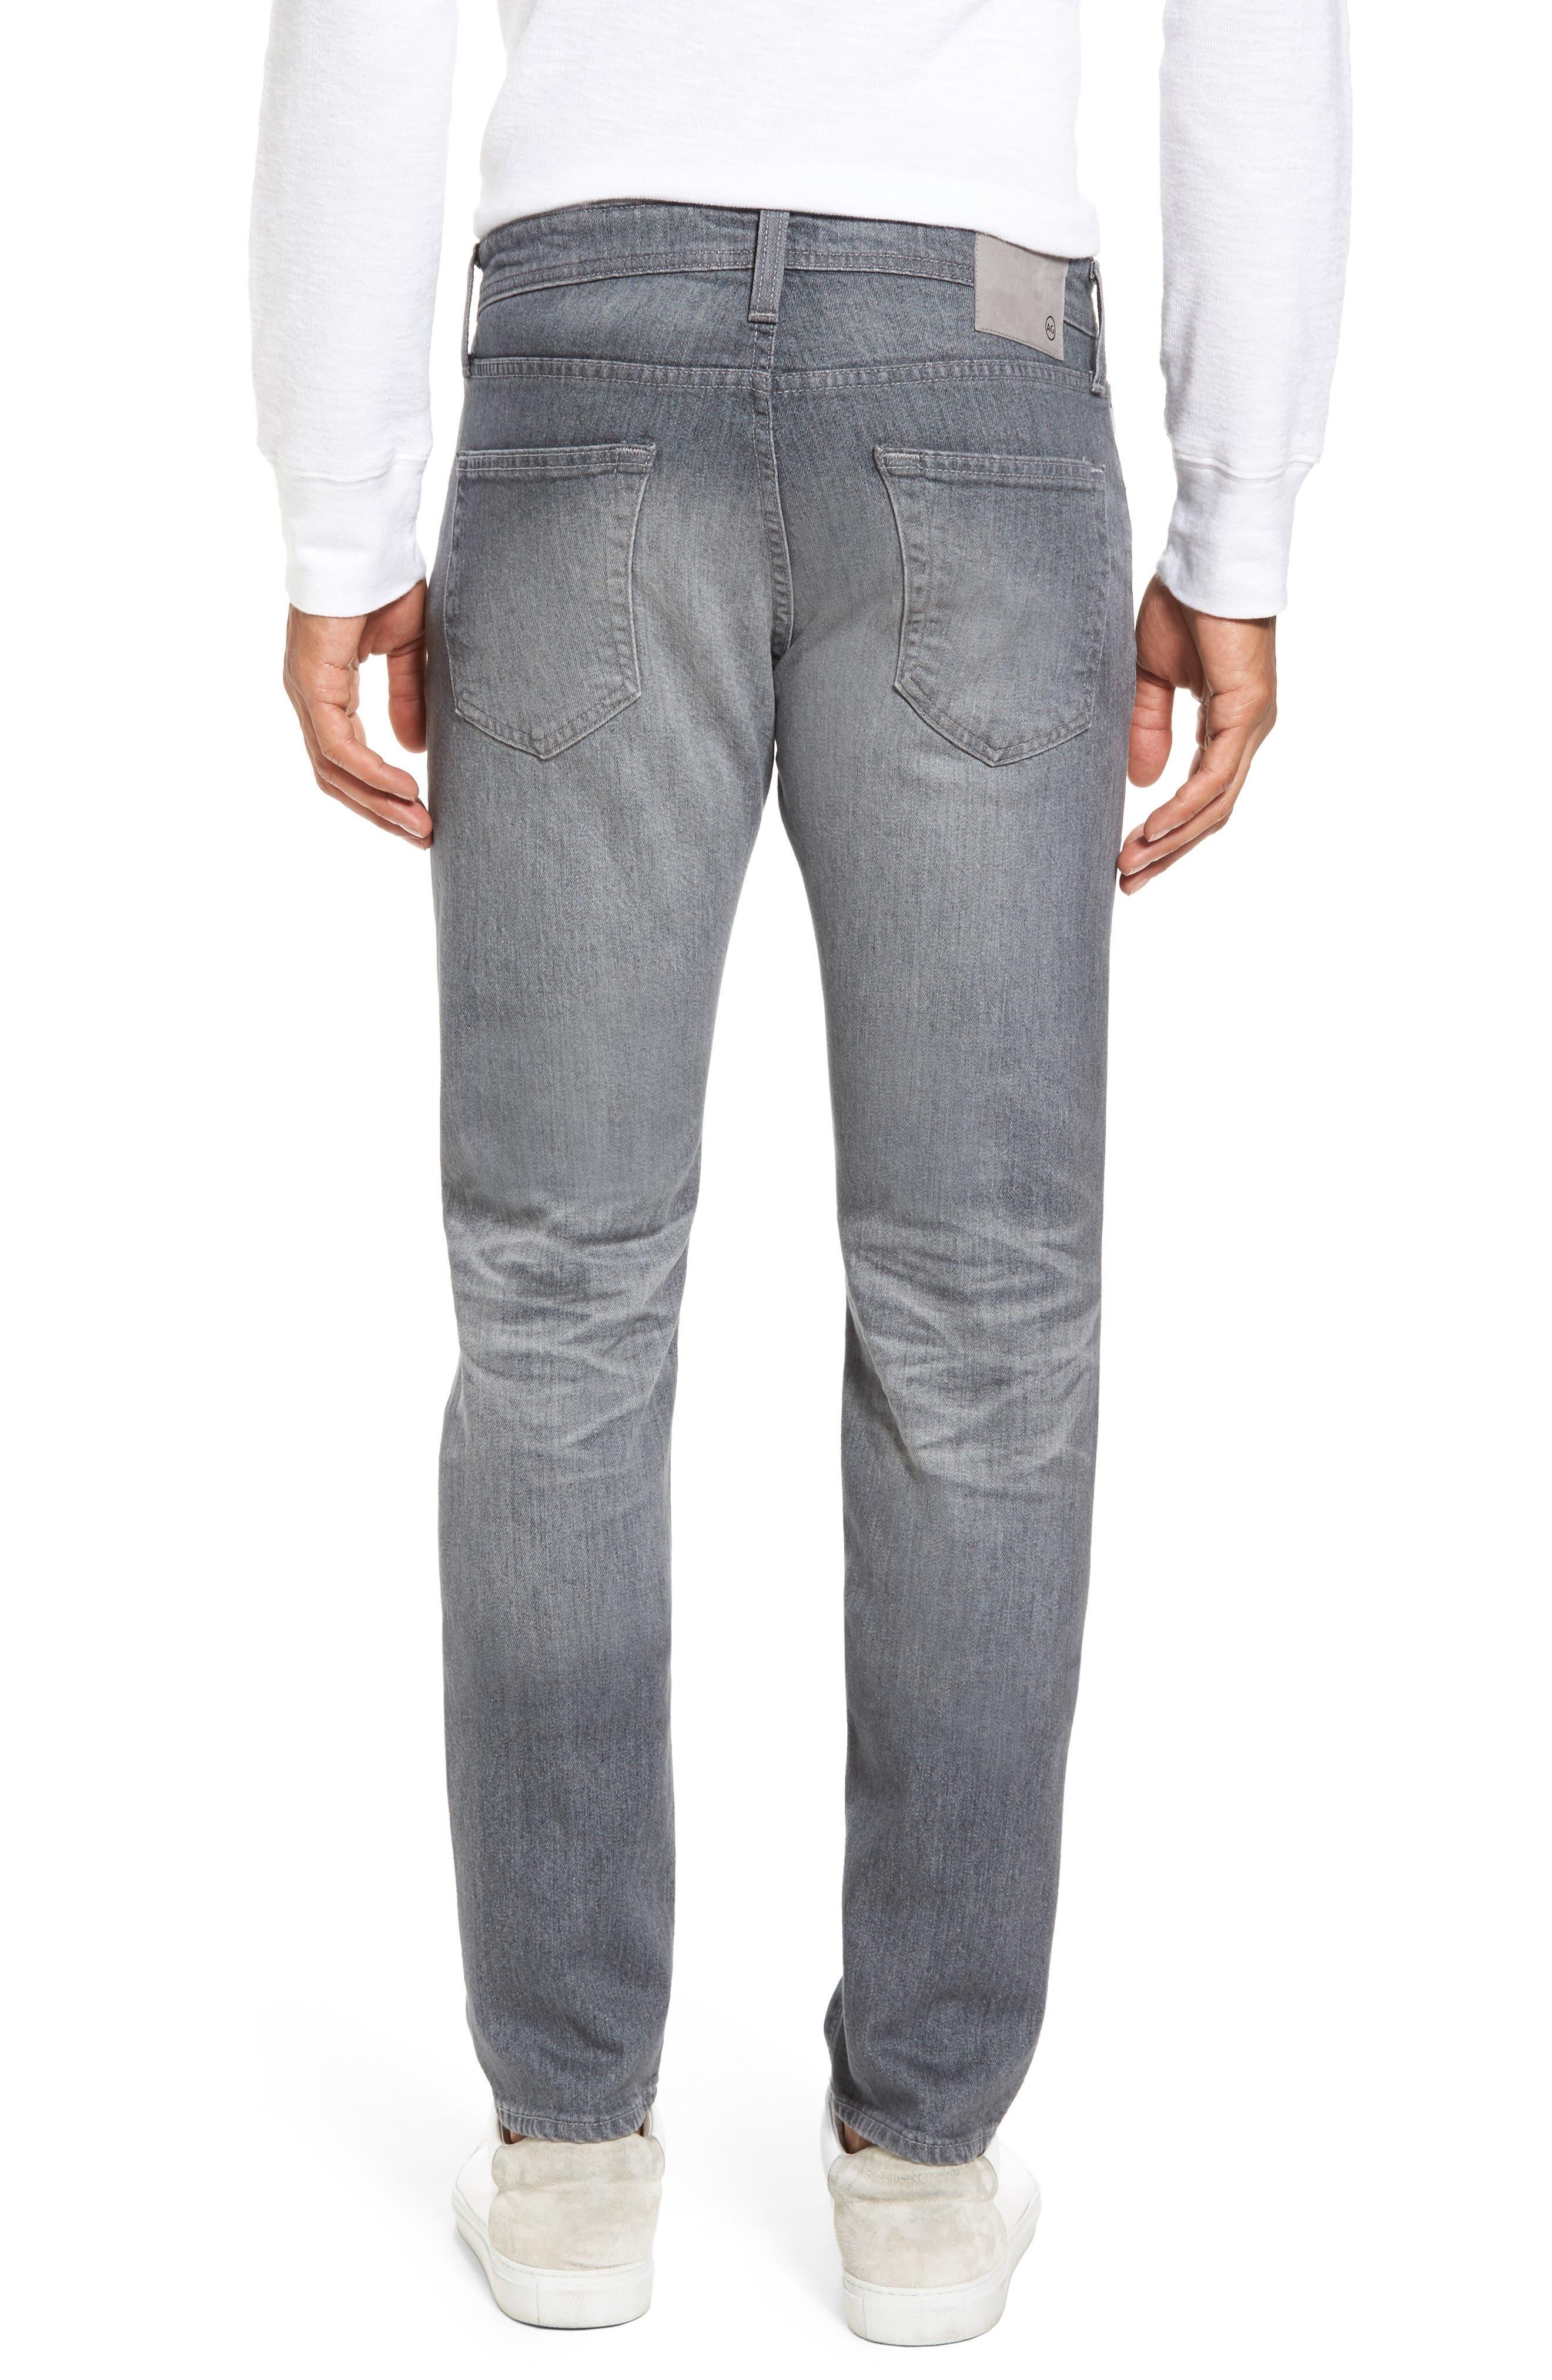 Tellis Modern Slim Fit Jeans,                             Alternate thumbnail 2, color,                             020